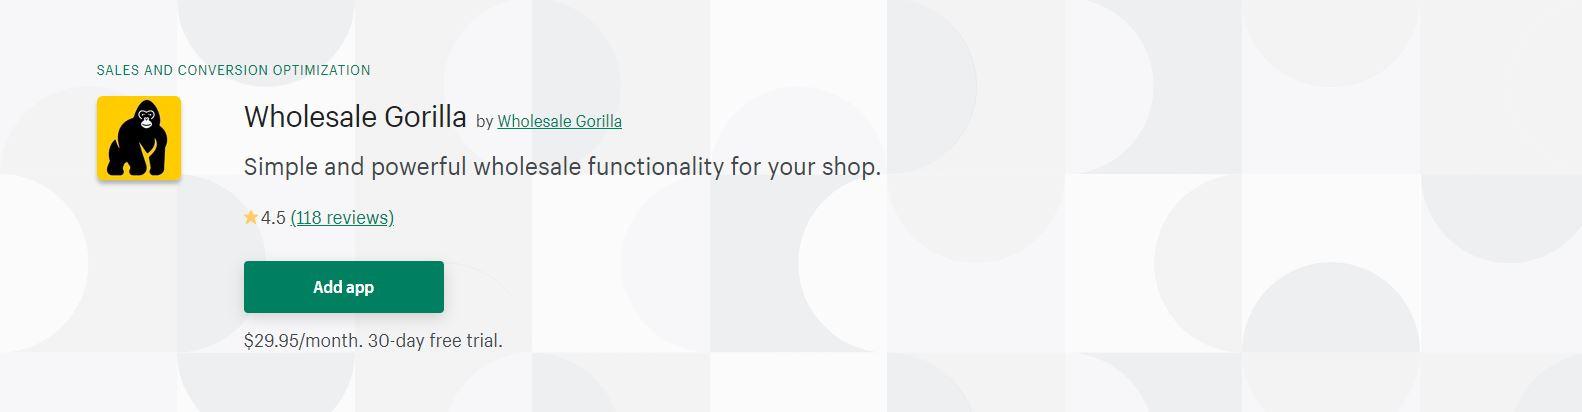 Best wholesale app for shopify